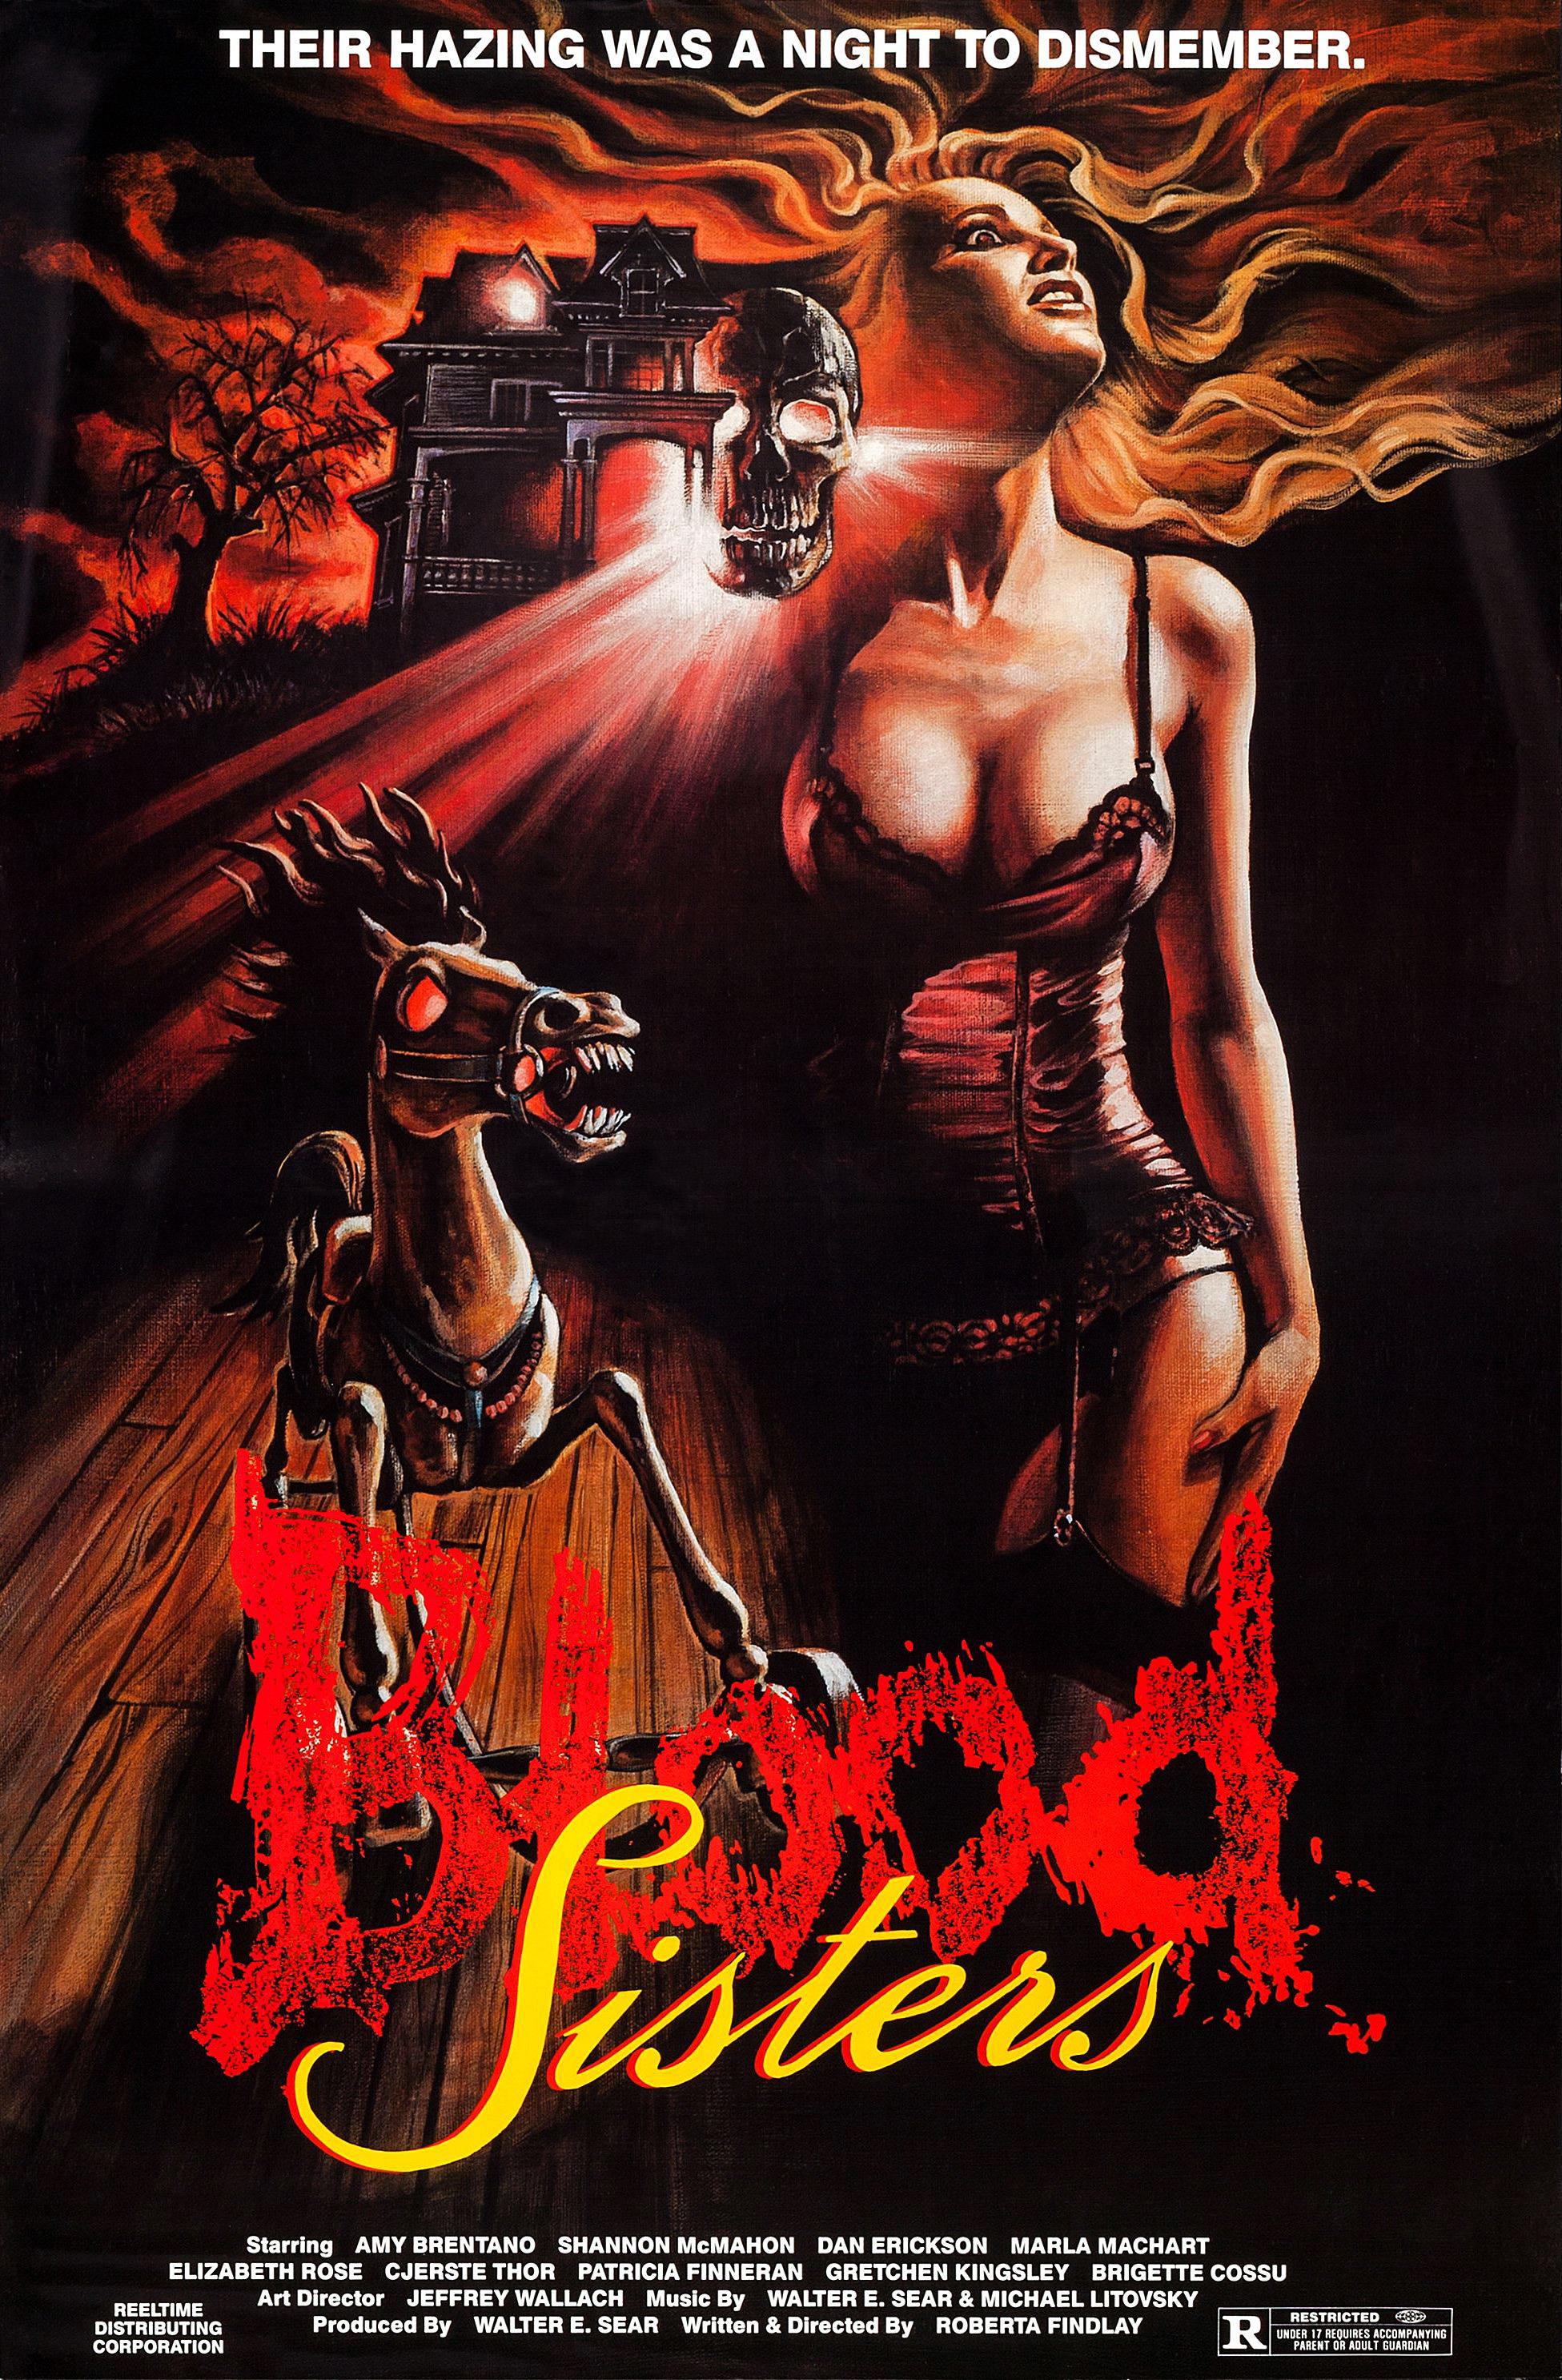 Blood and sex nightmare movie online